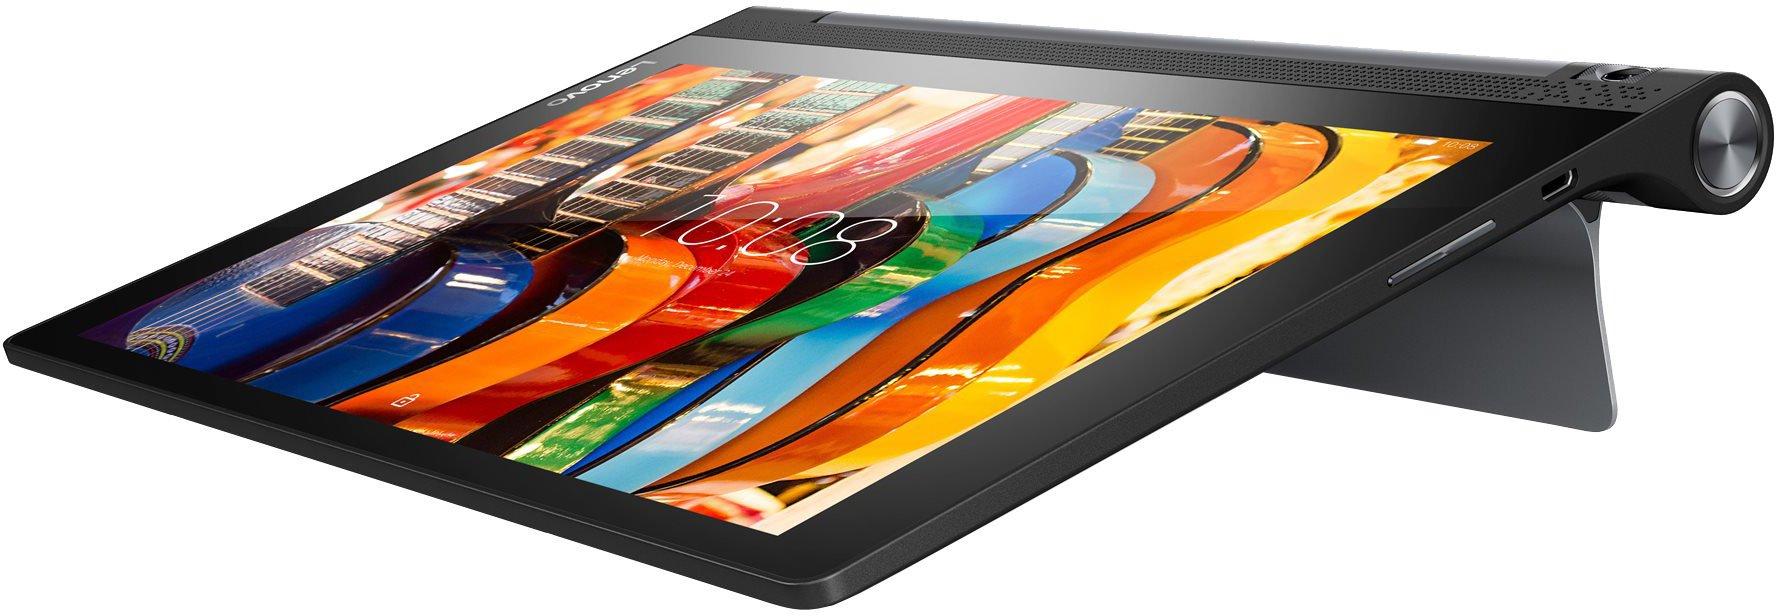 "Lenovo Yoga 3 10"" - X50L"